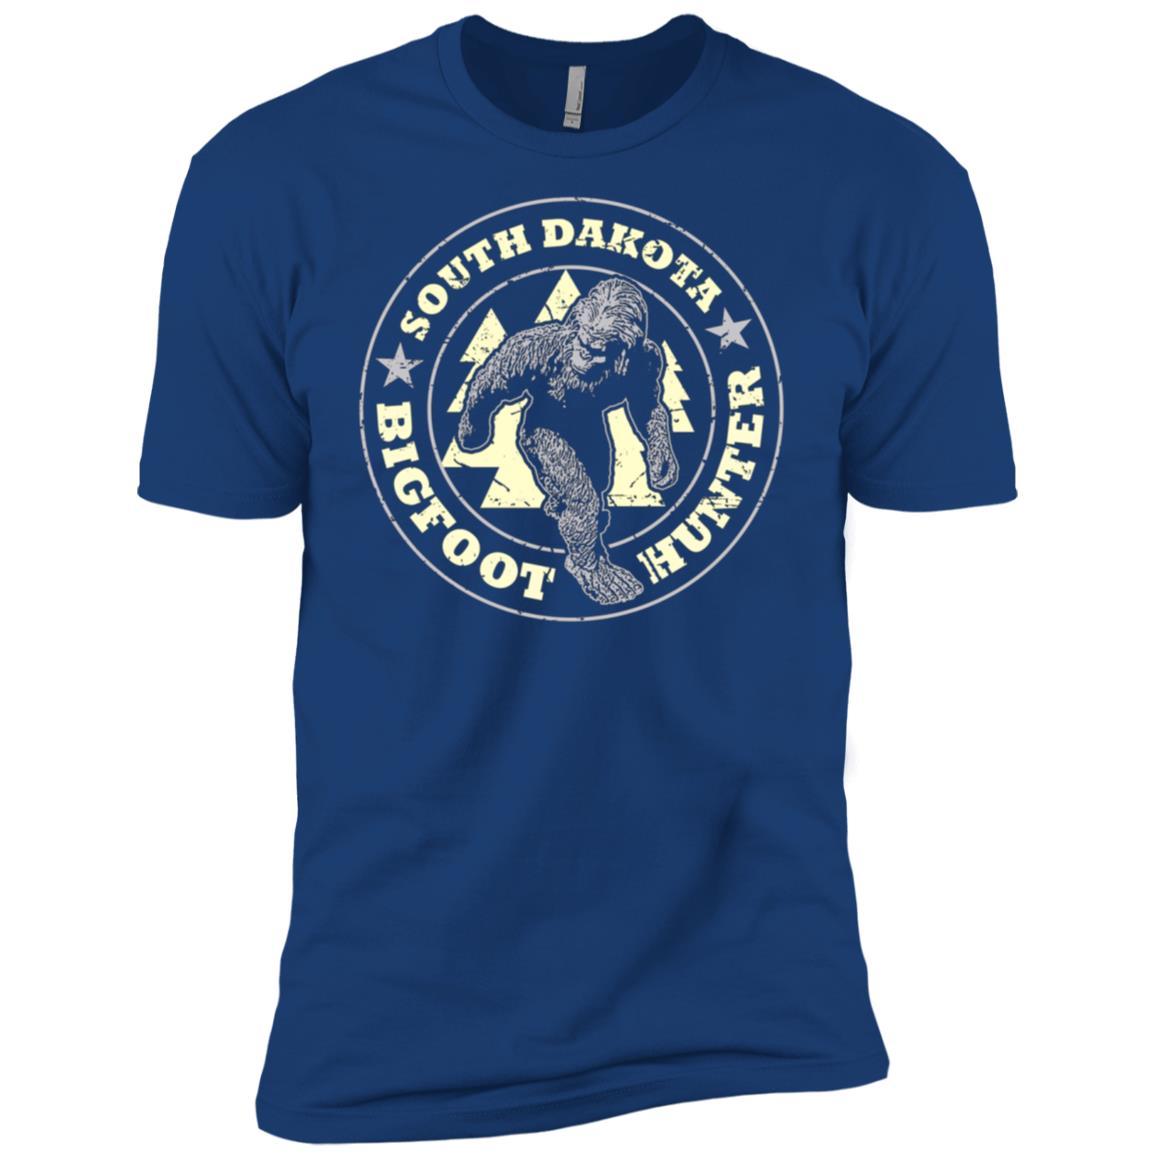 South Dakota Bigfoot Hunter Believe Men Short Sleeve T-Shirt